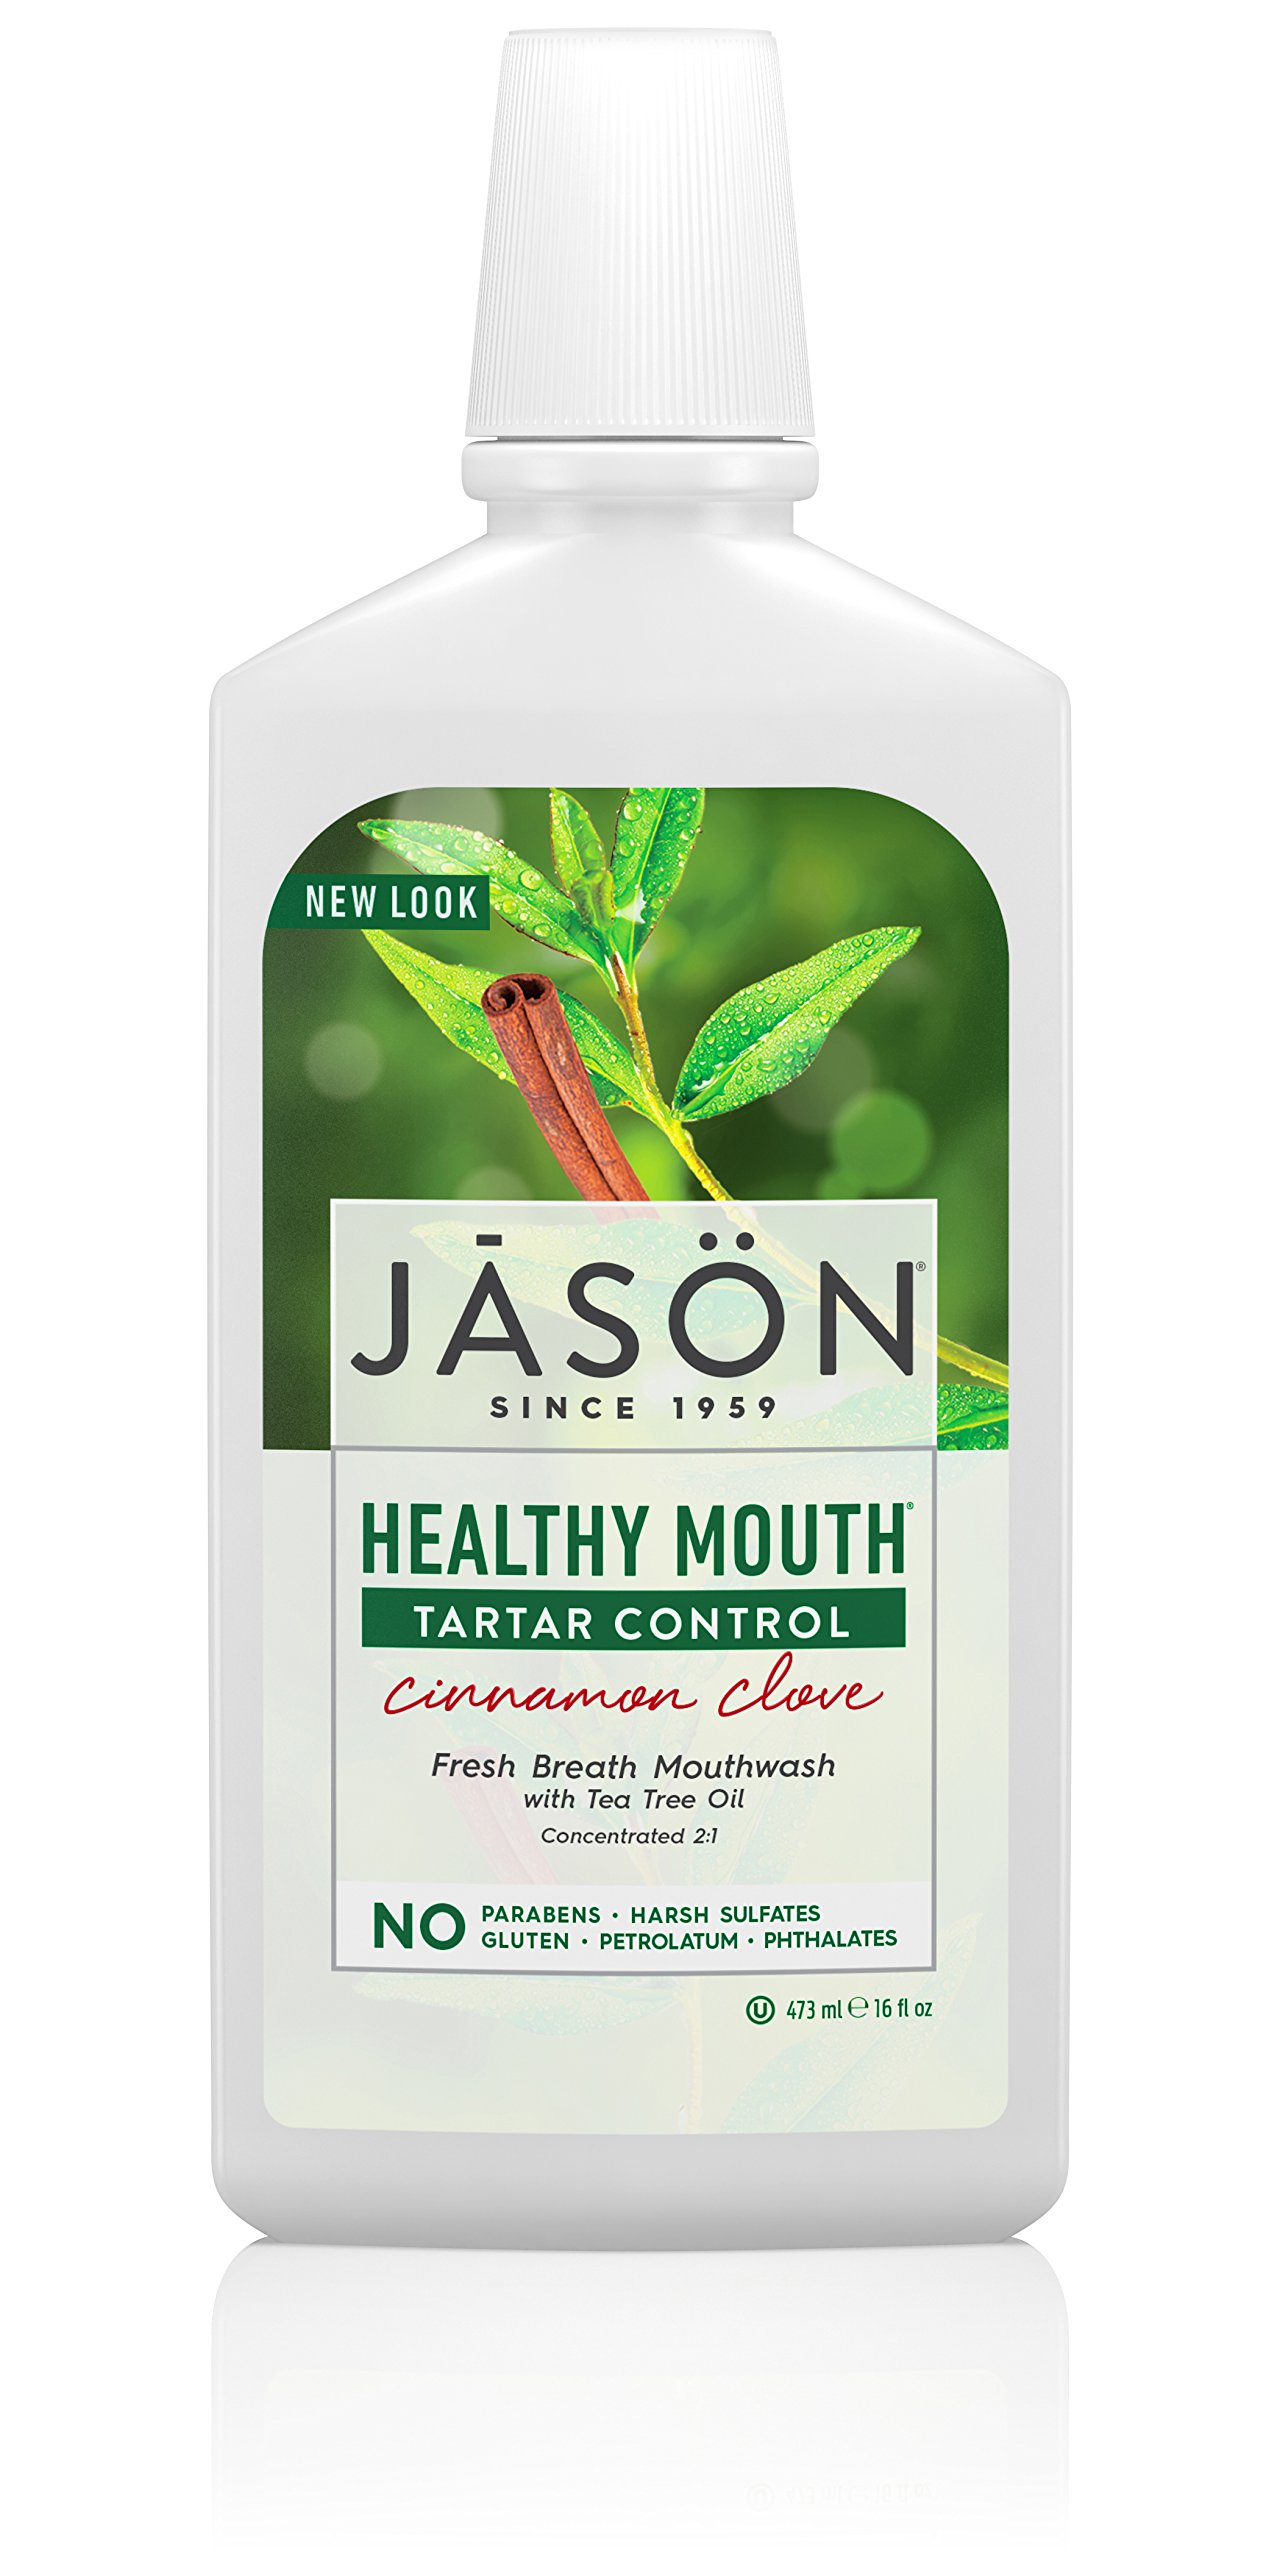 JASON Natural Healthy Mouth Naturally Bacteria-Fighting Mouthwash 16.0 oz